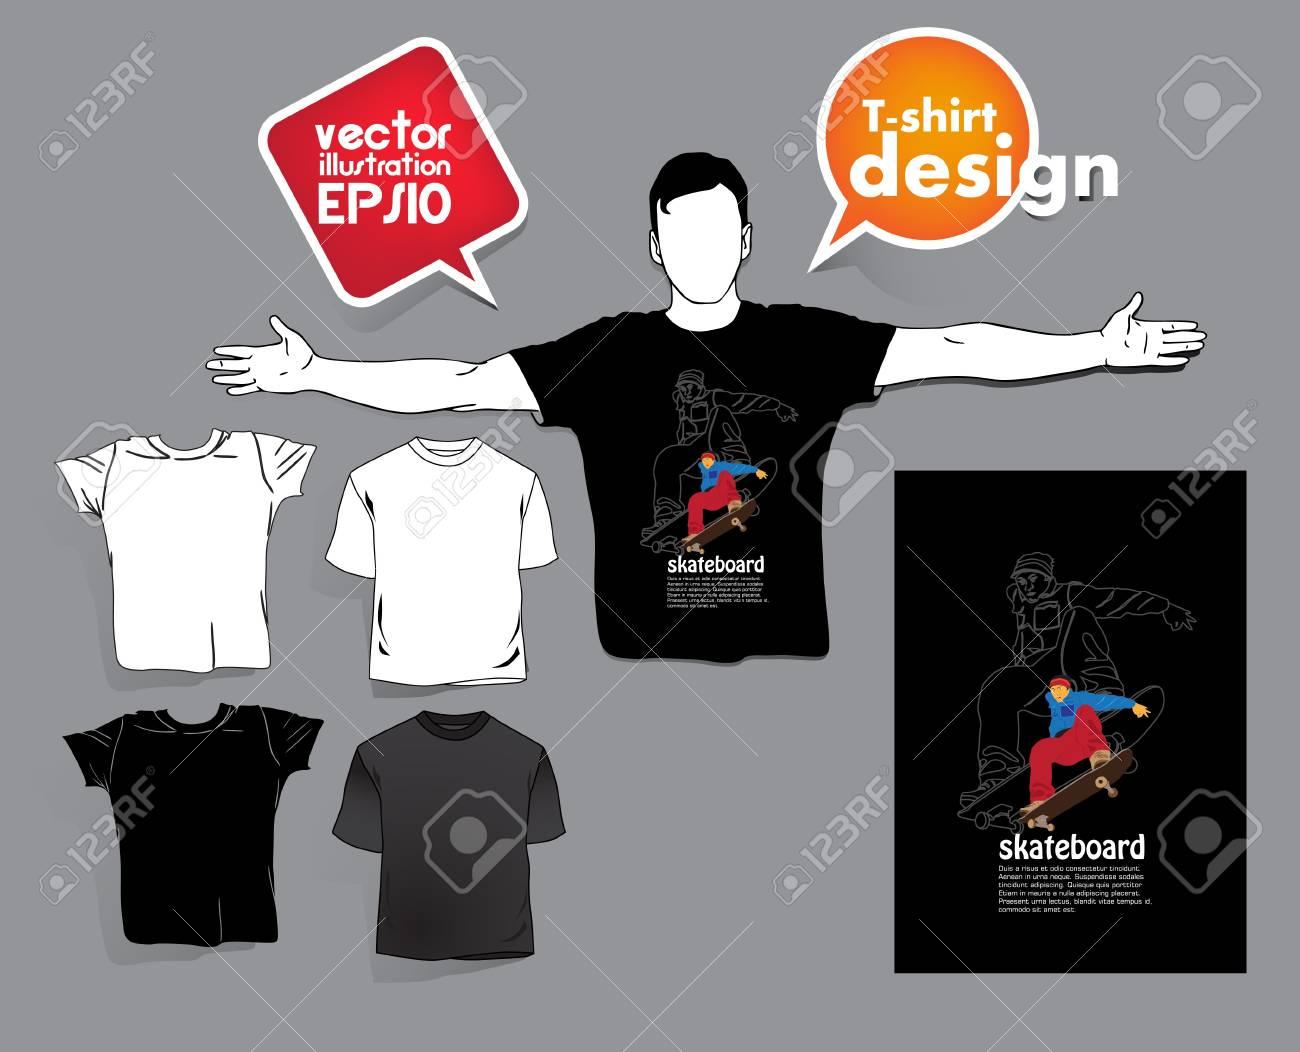 T-shirt design Stock Vector - 17413429